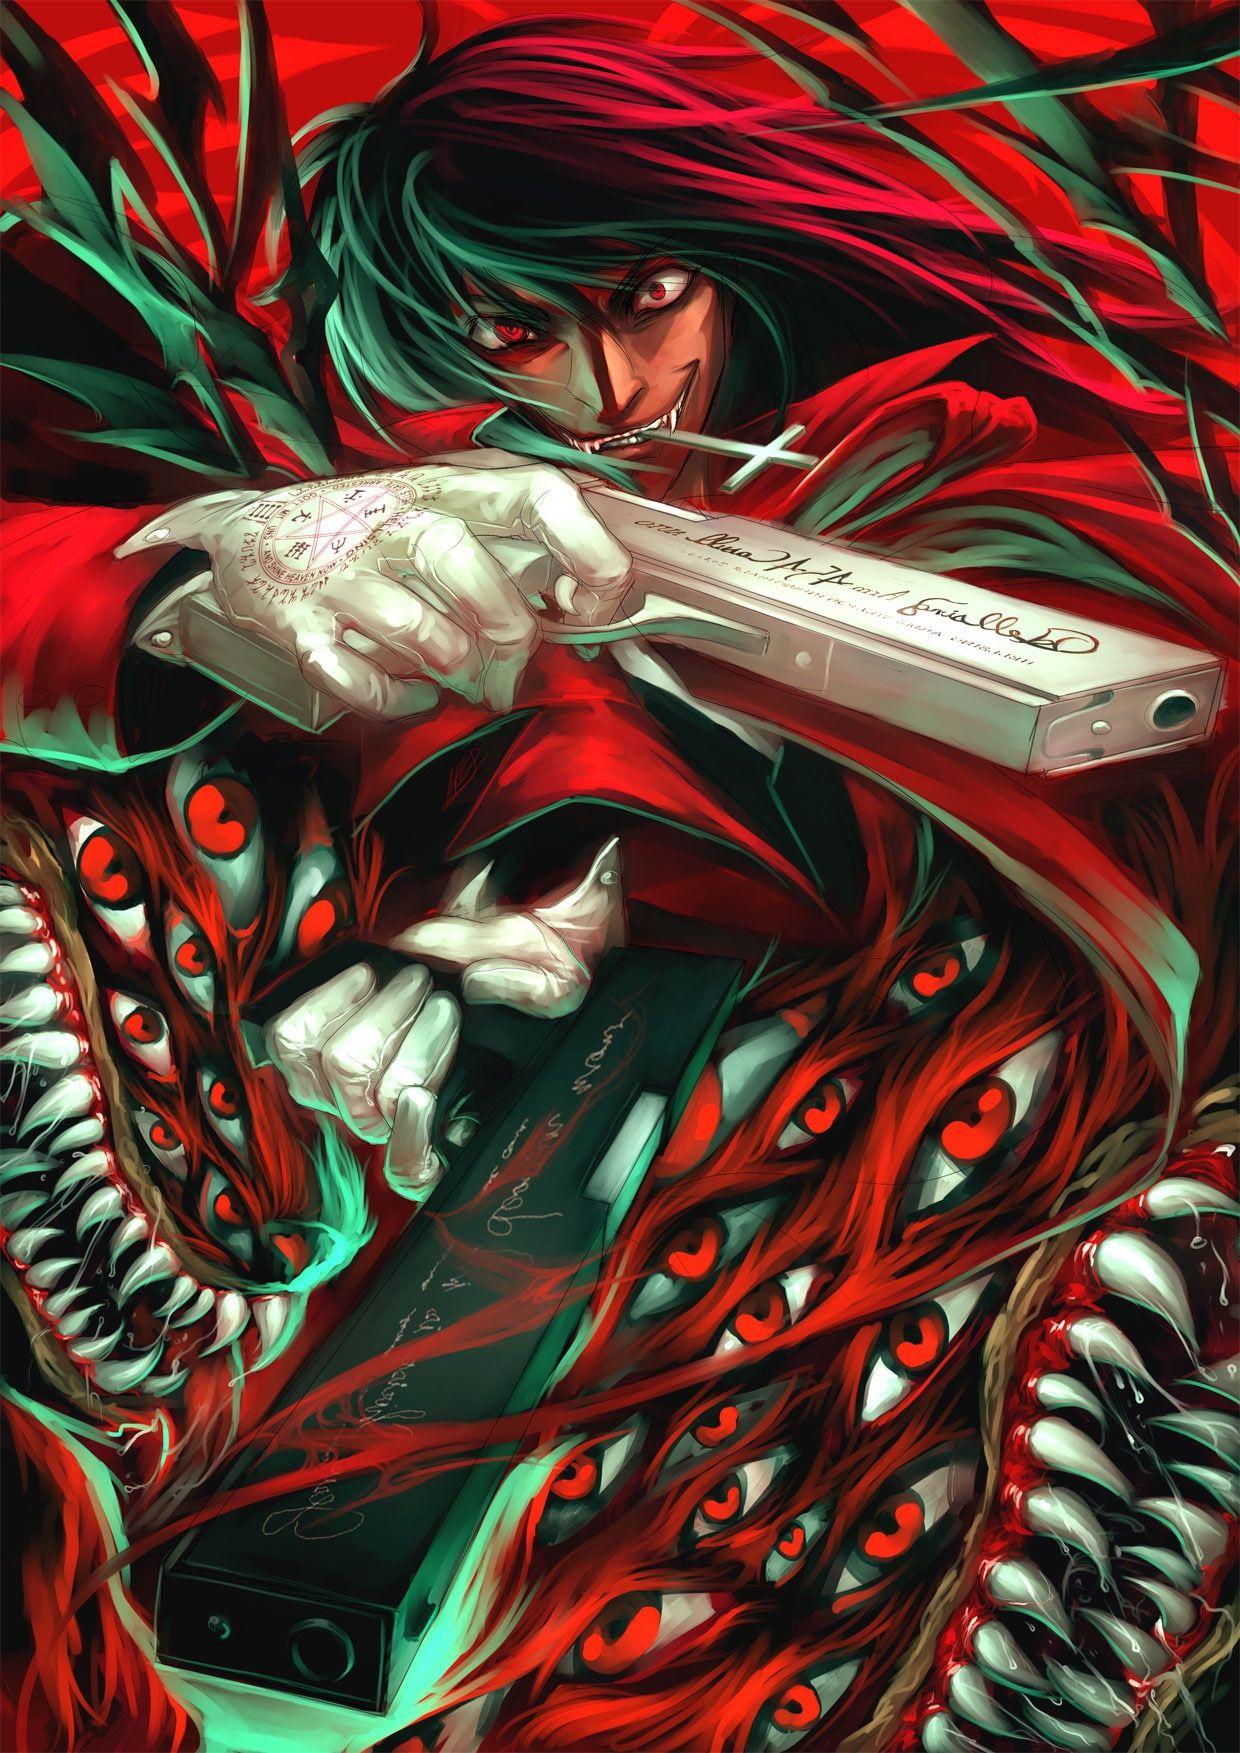 Hellsing Alucard Vampires 1240x1753 Anime Hellsing Hd Art Alucard Hellsing 720p Wallpaper Hdwallpaper Desktop Hellsing Alucard Alucard Hellsing Anime vampire wallpapers for android